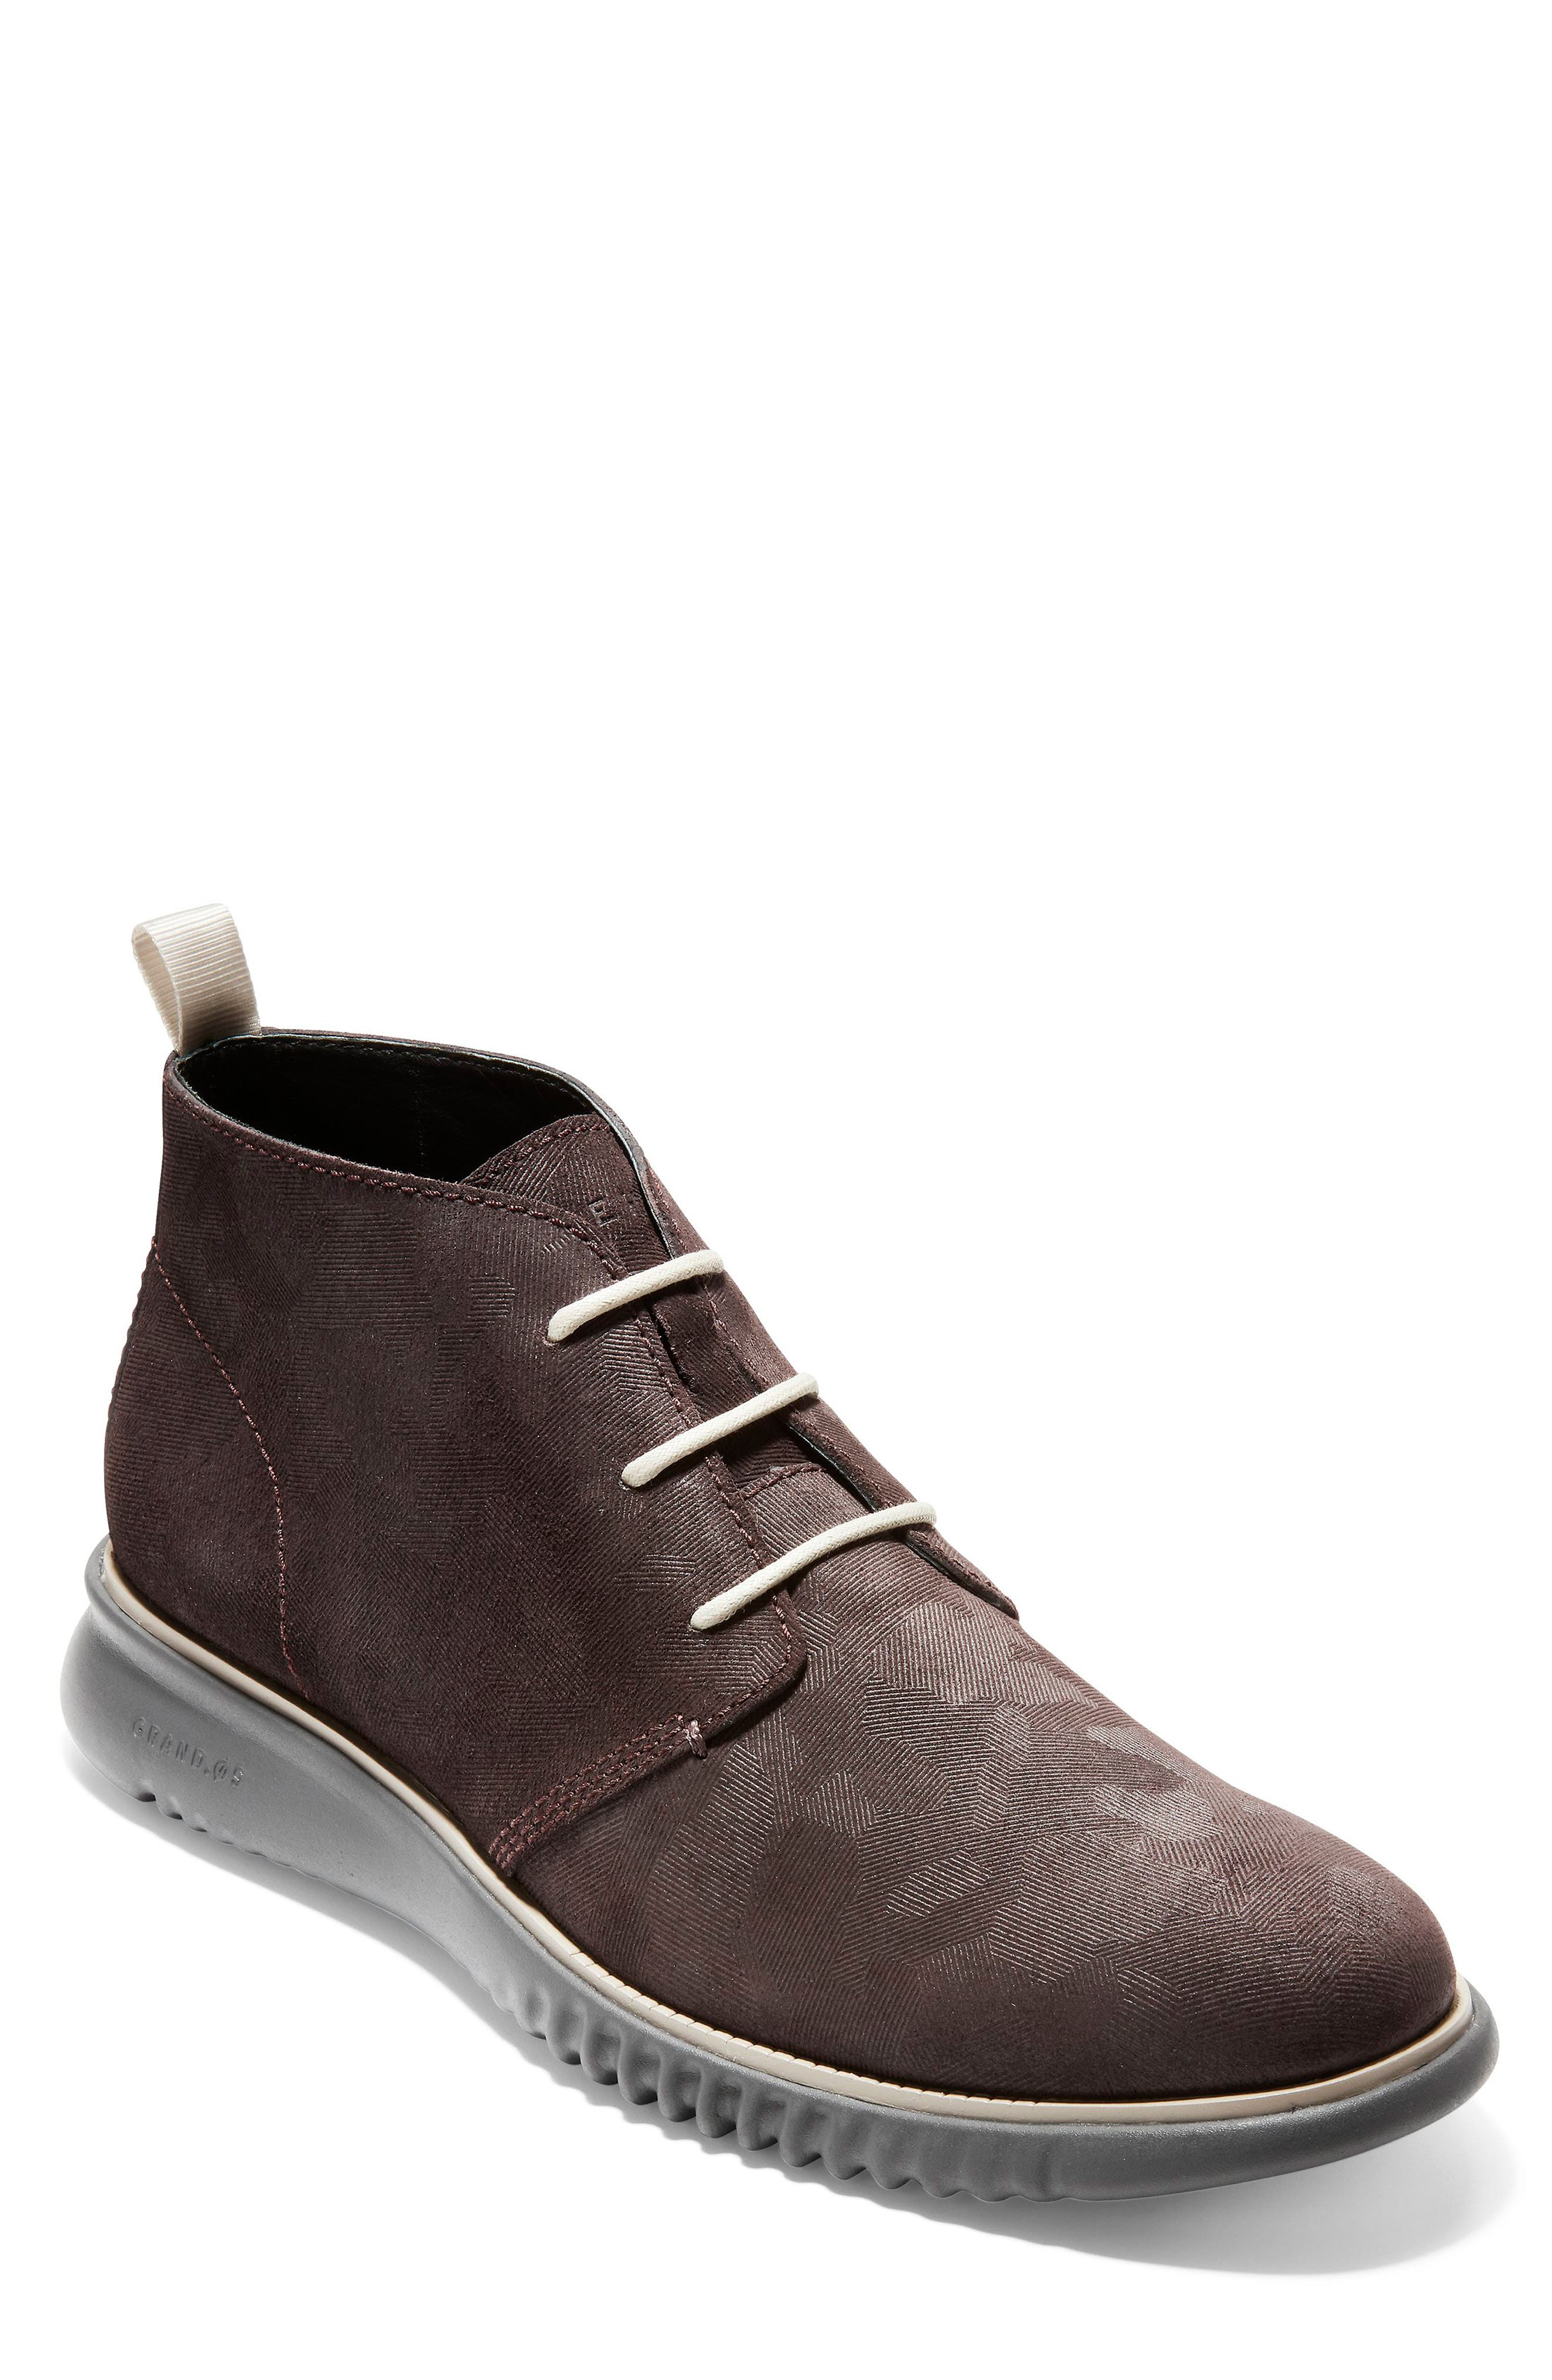 2.Zerogrand Chukka Boot,                             Main thumbnail 1, color,                             BLACK/ WALNUT SUEDE